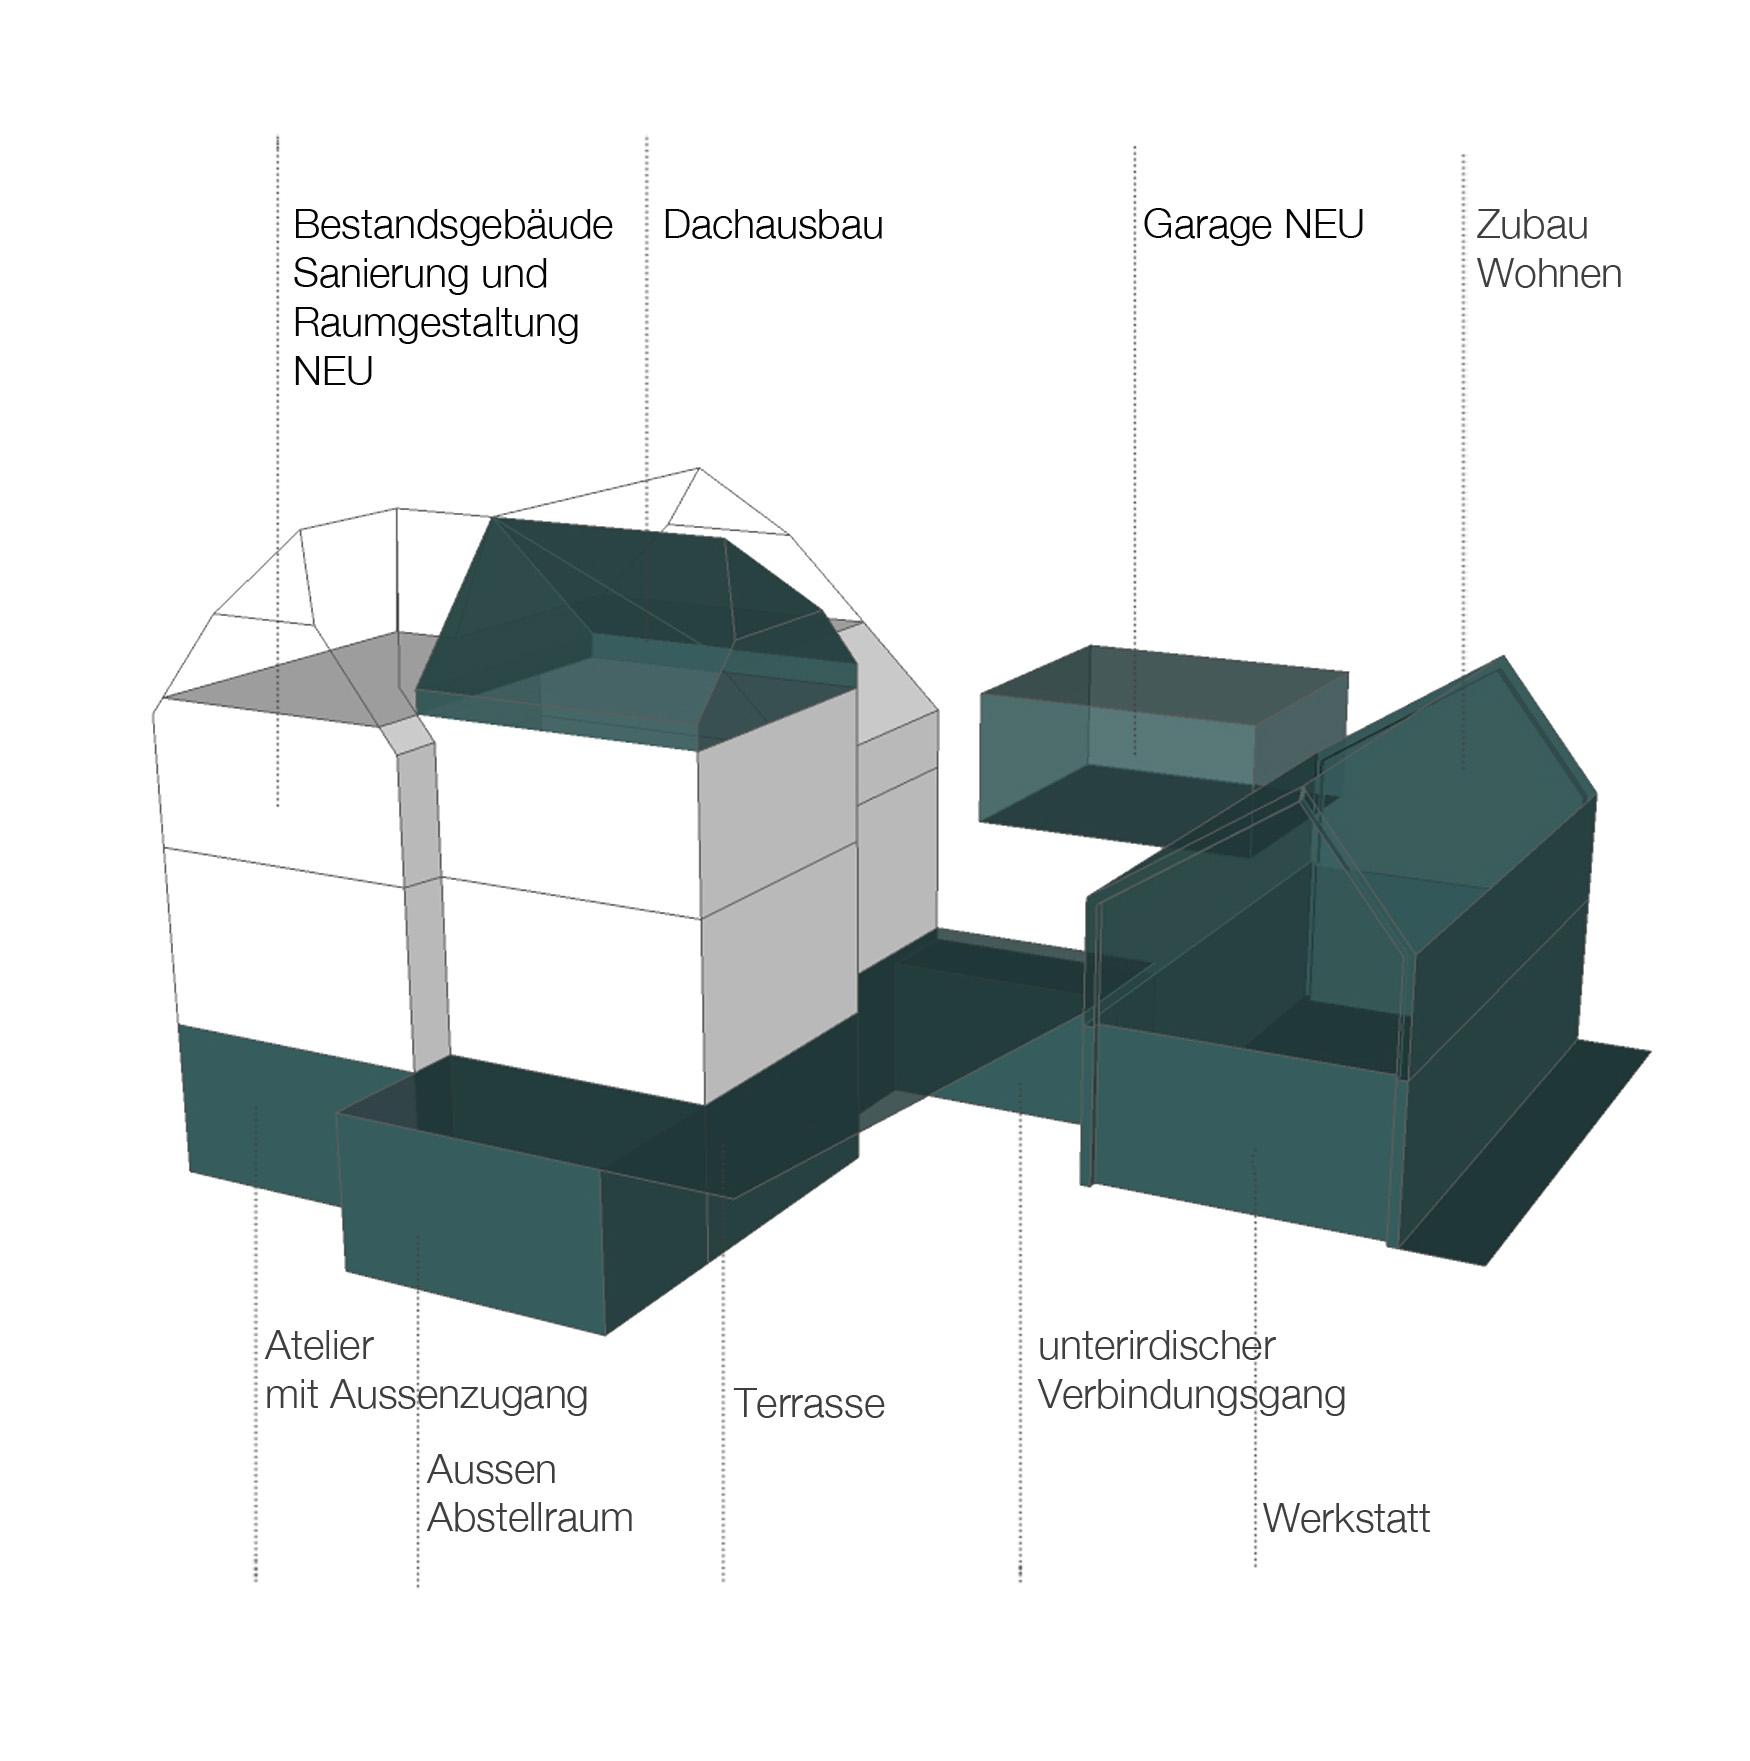 3D Strukturplan